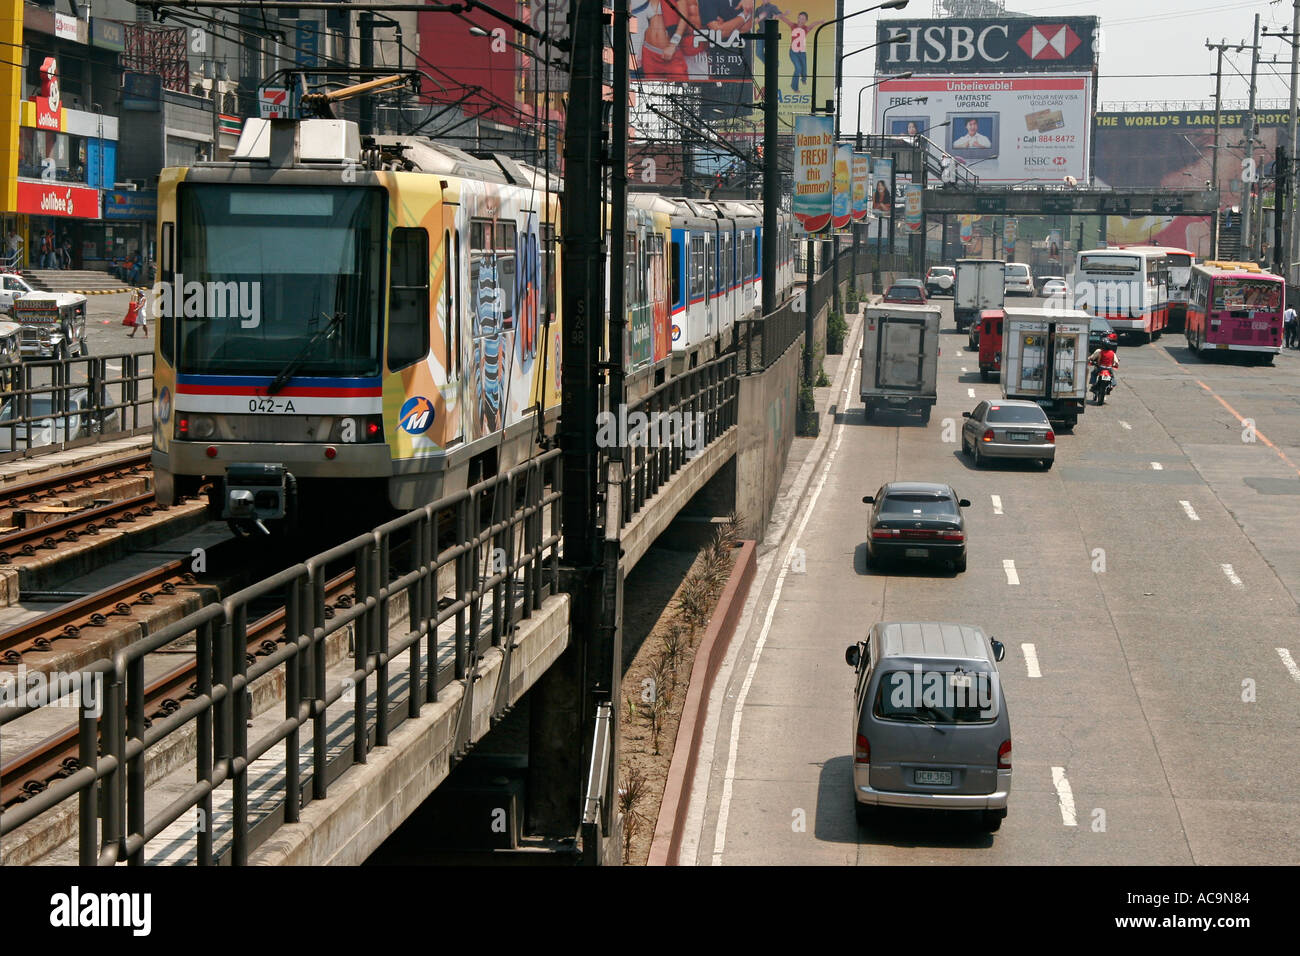 Manila Philippines Elevated Train Stock Photos & Manila Philippines